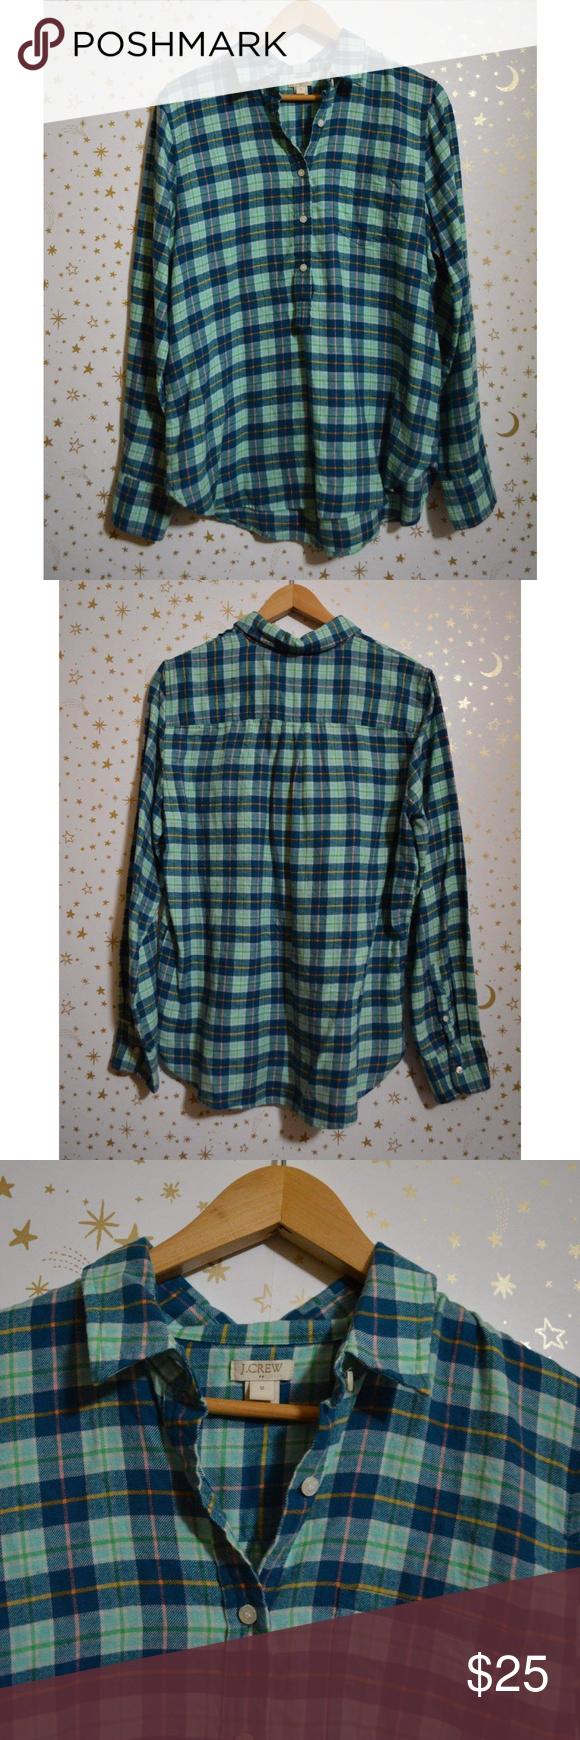 J. Crew Factory Blue & Mint Flannel Shirt Medium Size medium from J. Crew factory. Blue and mint col...